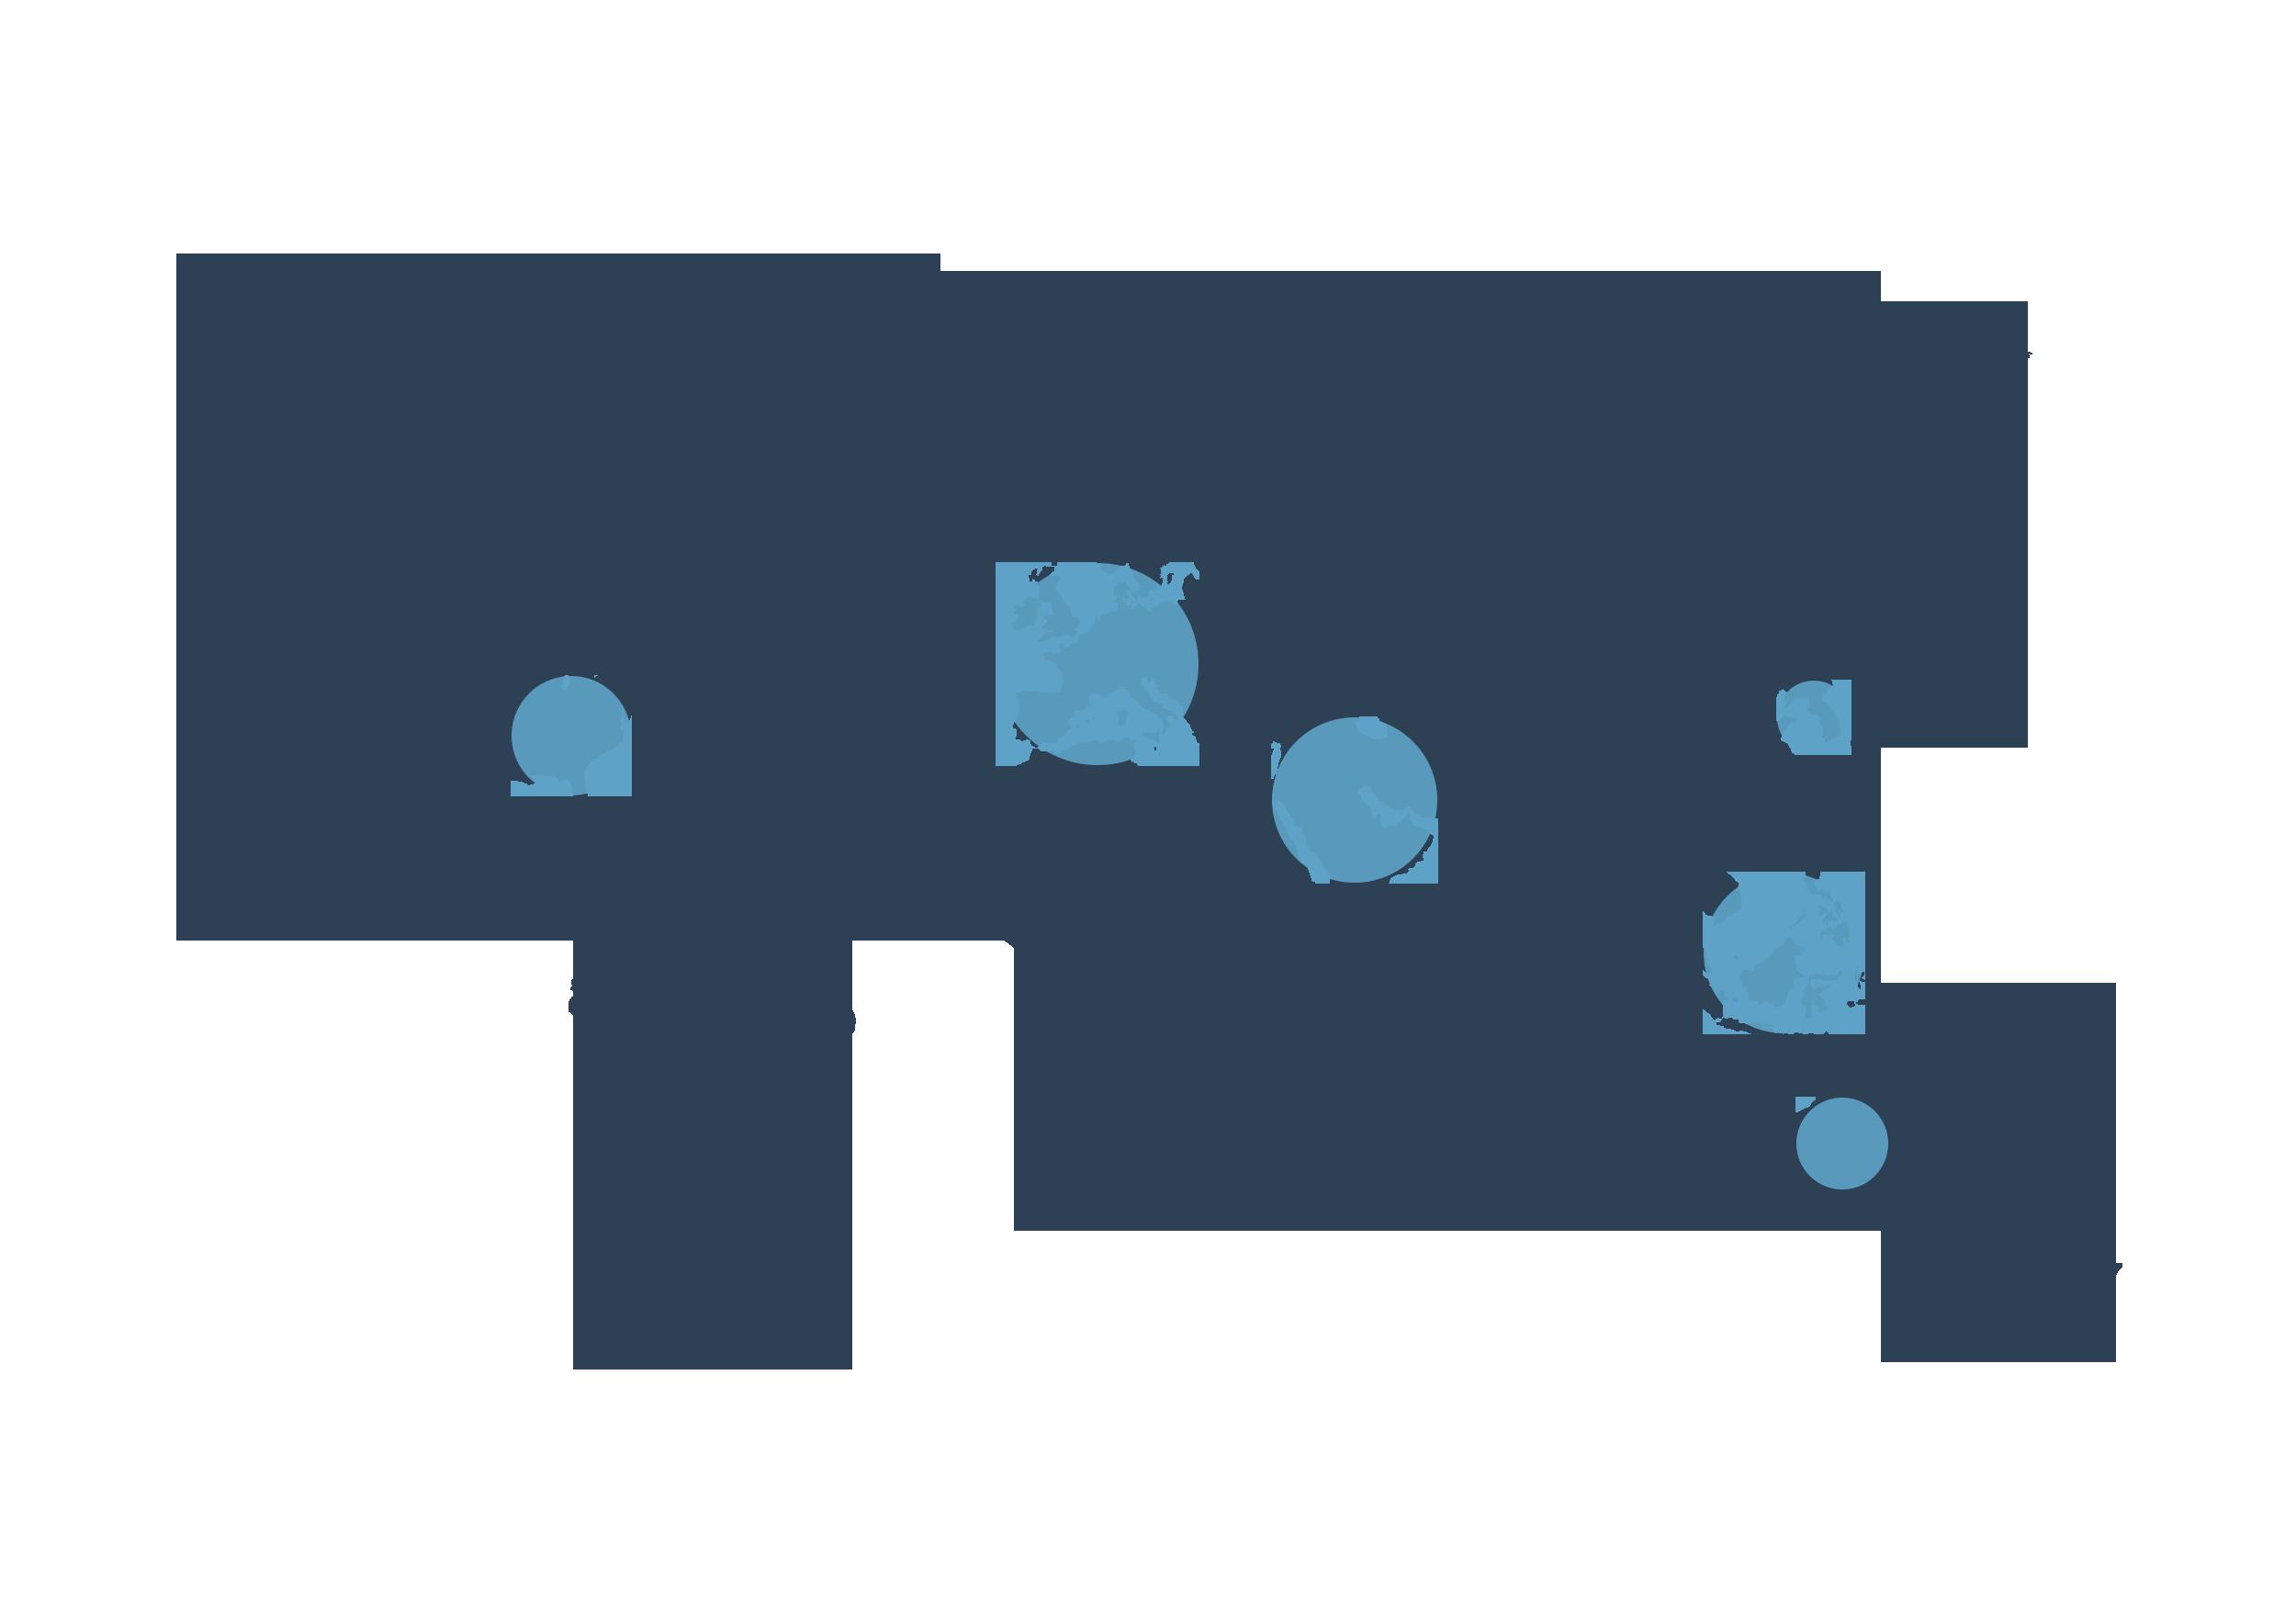 carte-mondiale-modec